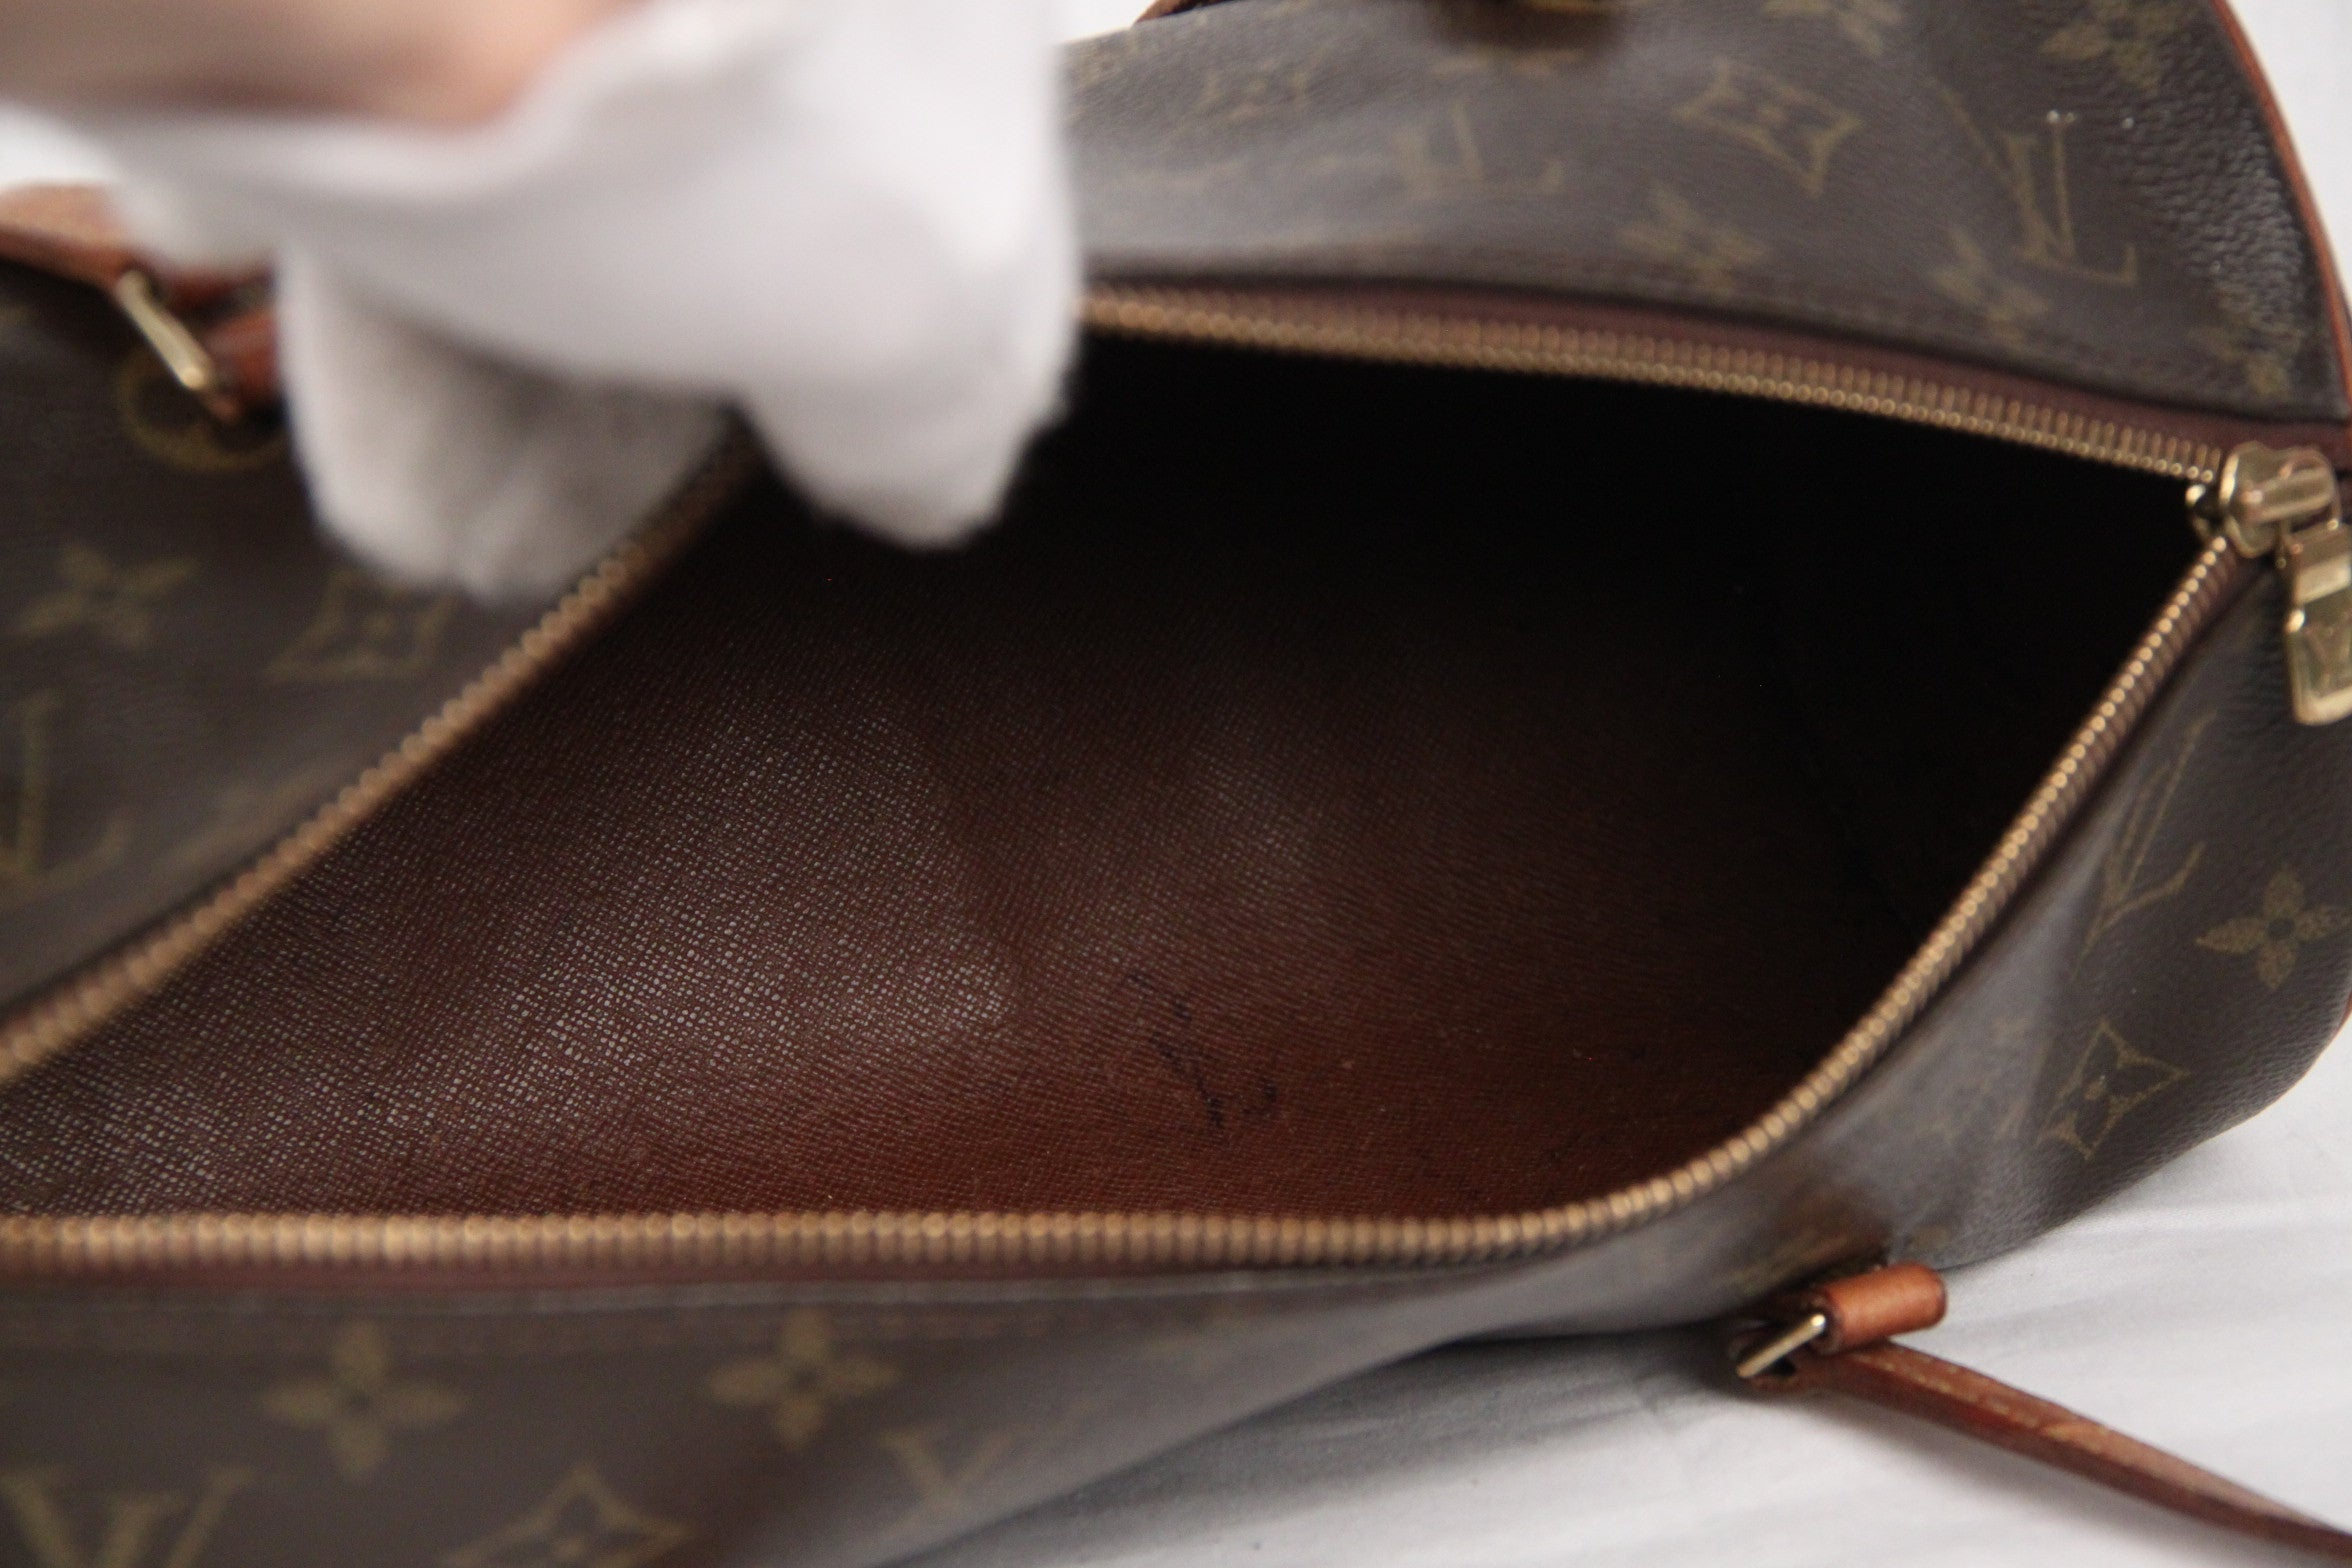 LOUIS VUITTON Brown Monogram Canvas PAPILLON 30 Handbag at 1stdibs 0ed8e4455d94c